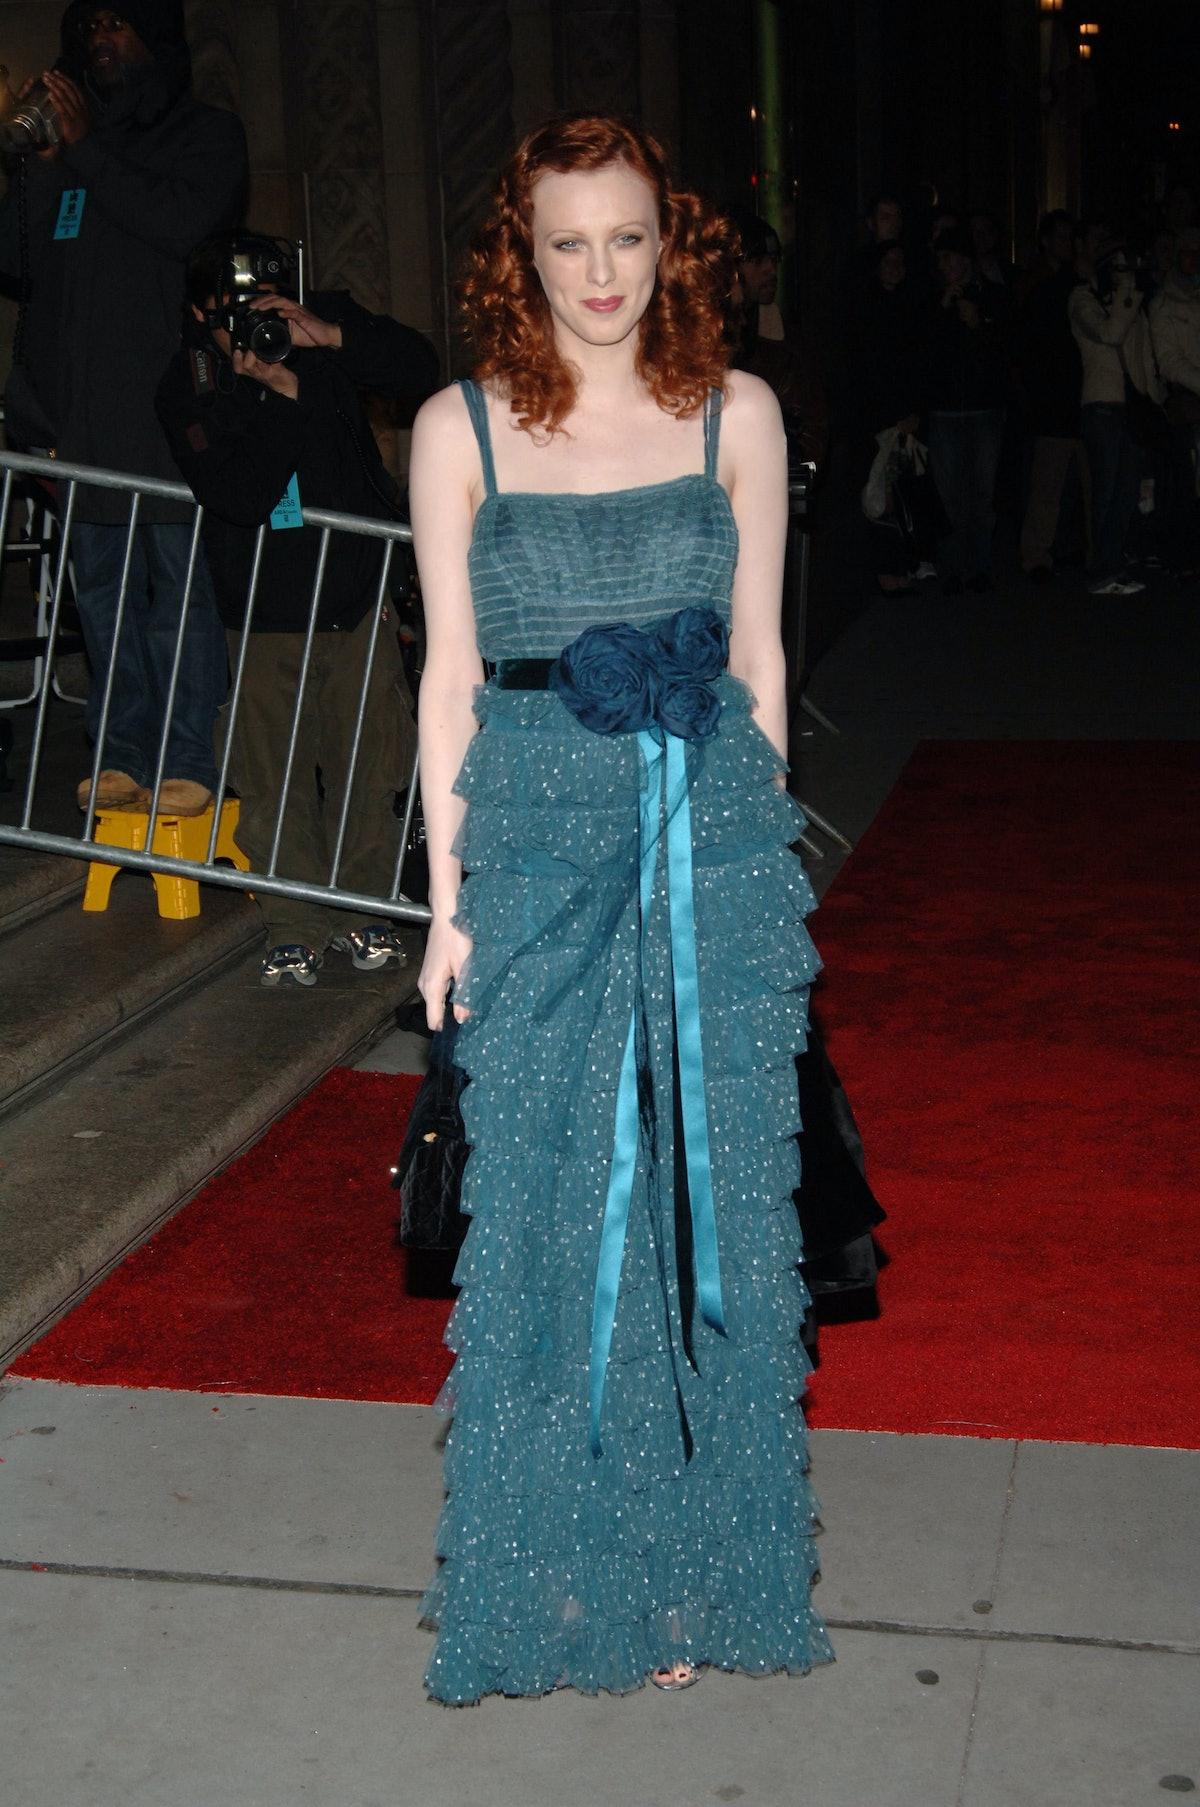 Fashion Group International Presents the 22nd Annual Night of Stars Honoring The Romantics